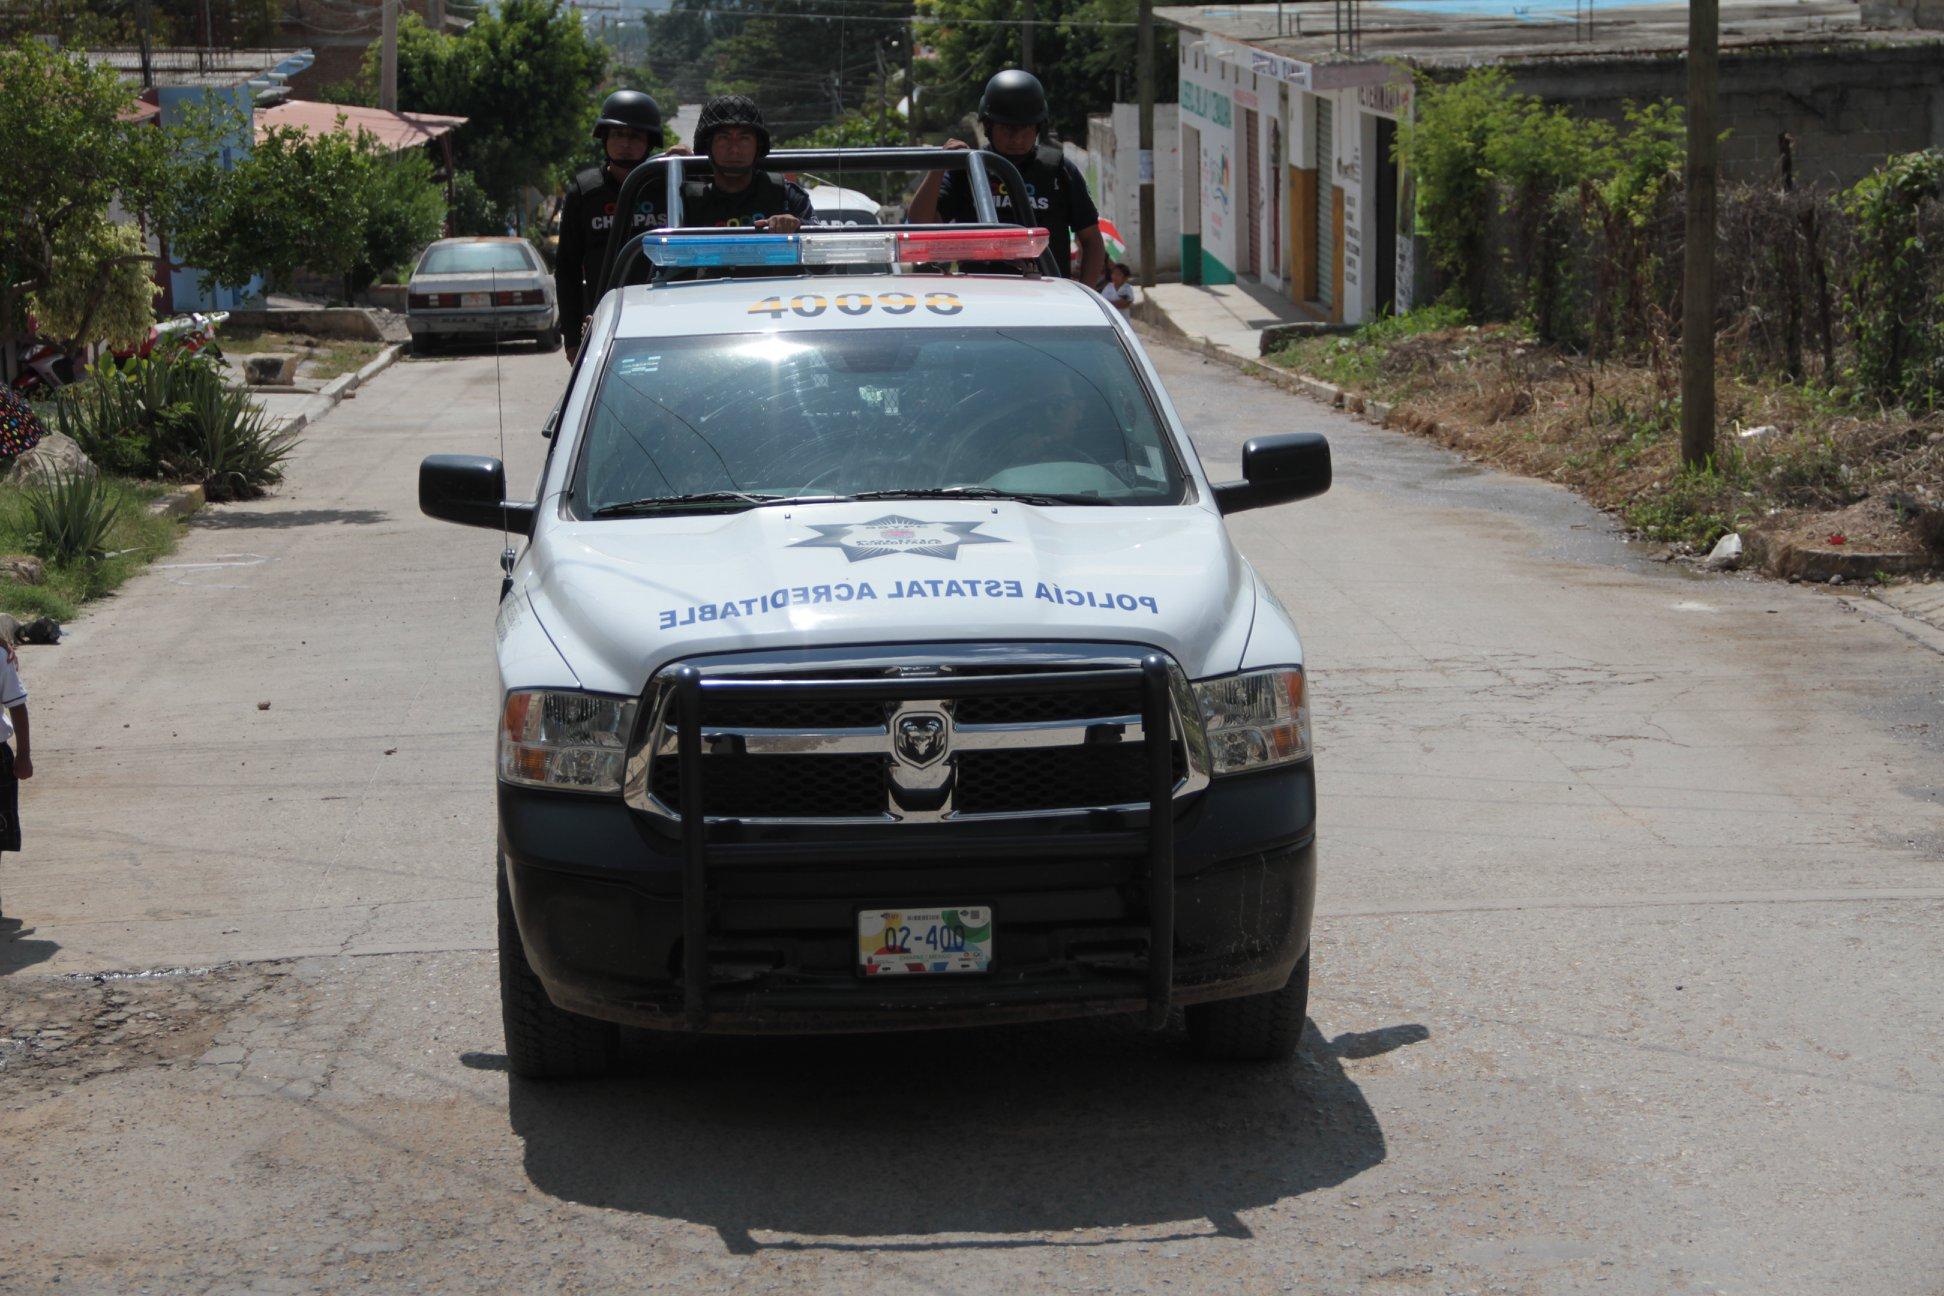 SSyPC detiene con droga a presunto integrante de banda delictiva